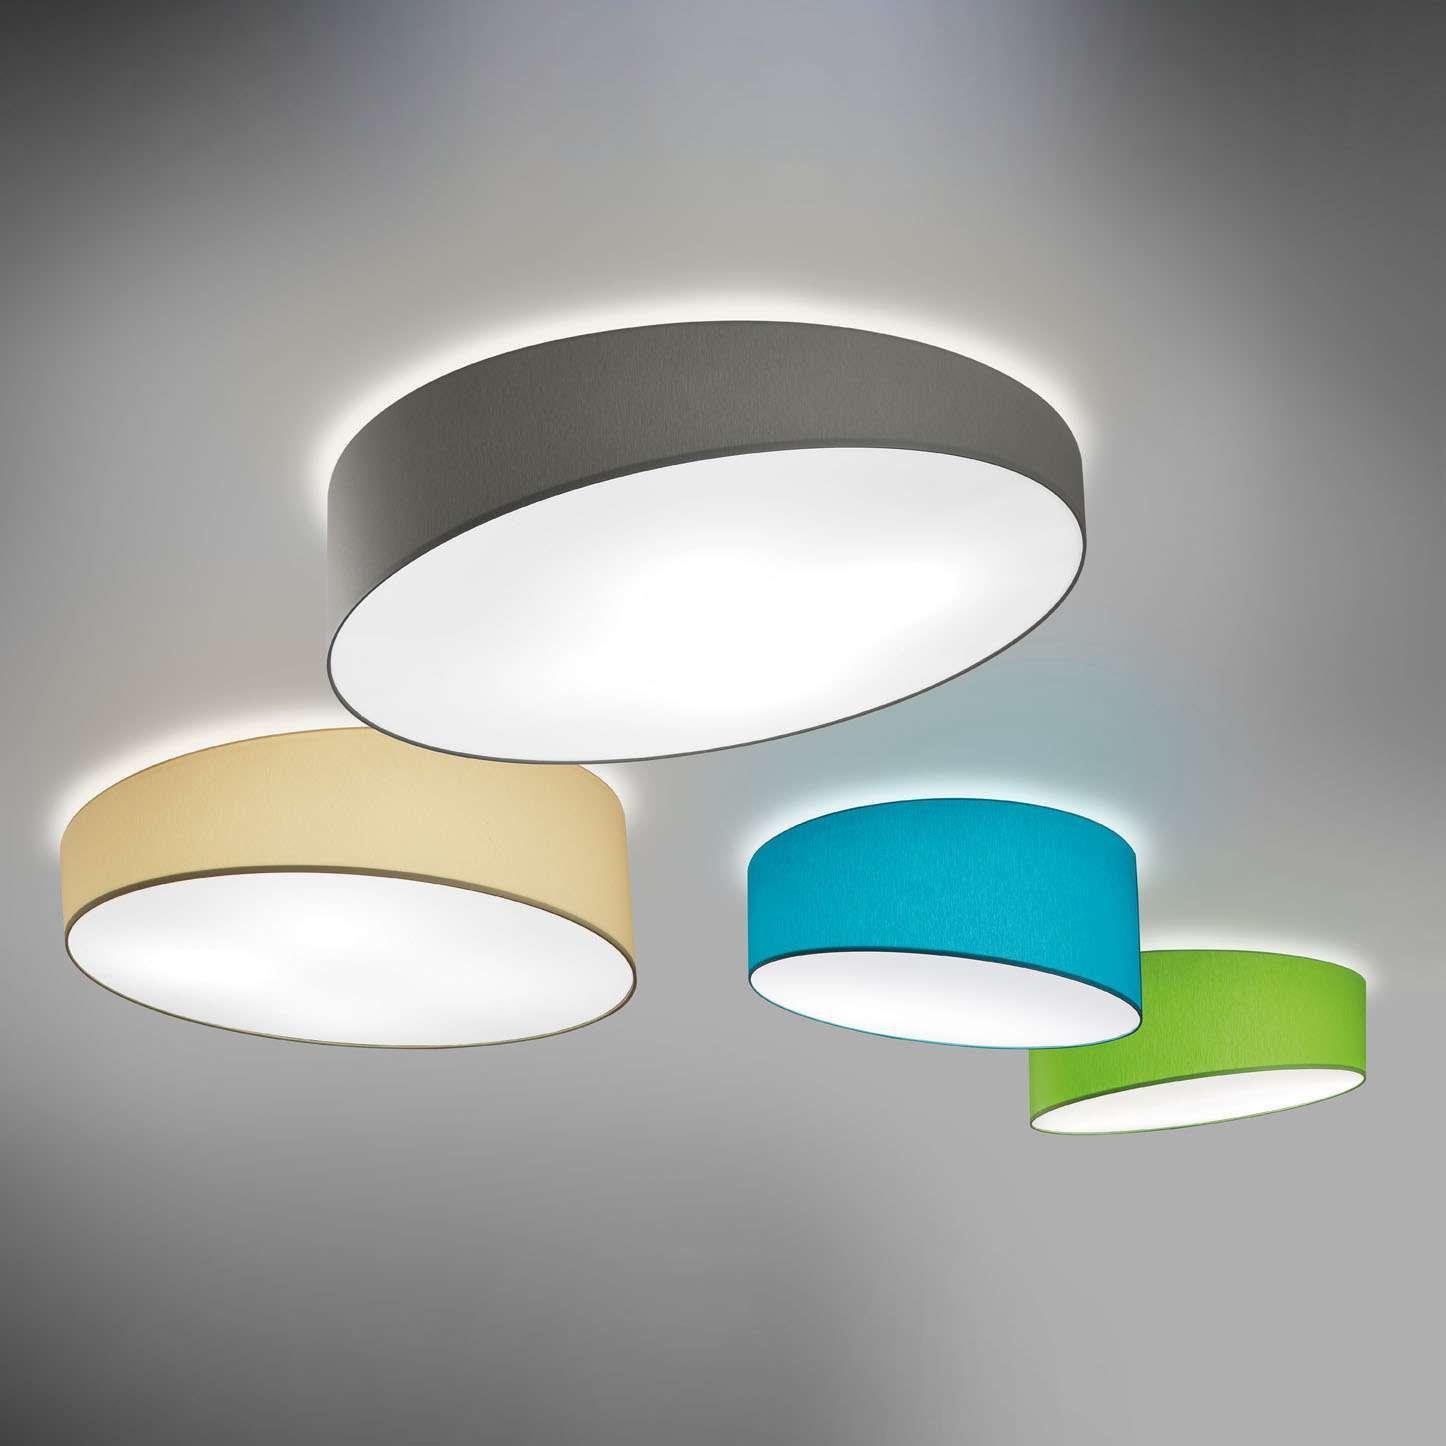 modern lighting concepts. Pank PL Ceiling Light. Lighting ConceptsModern Modern Concepts H